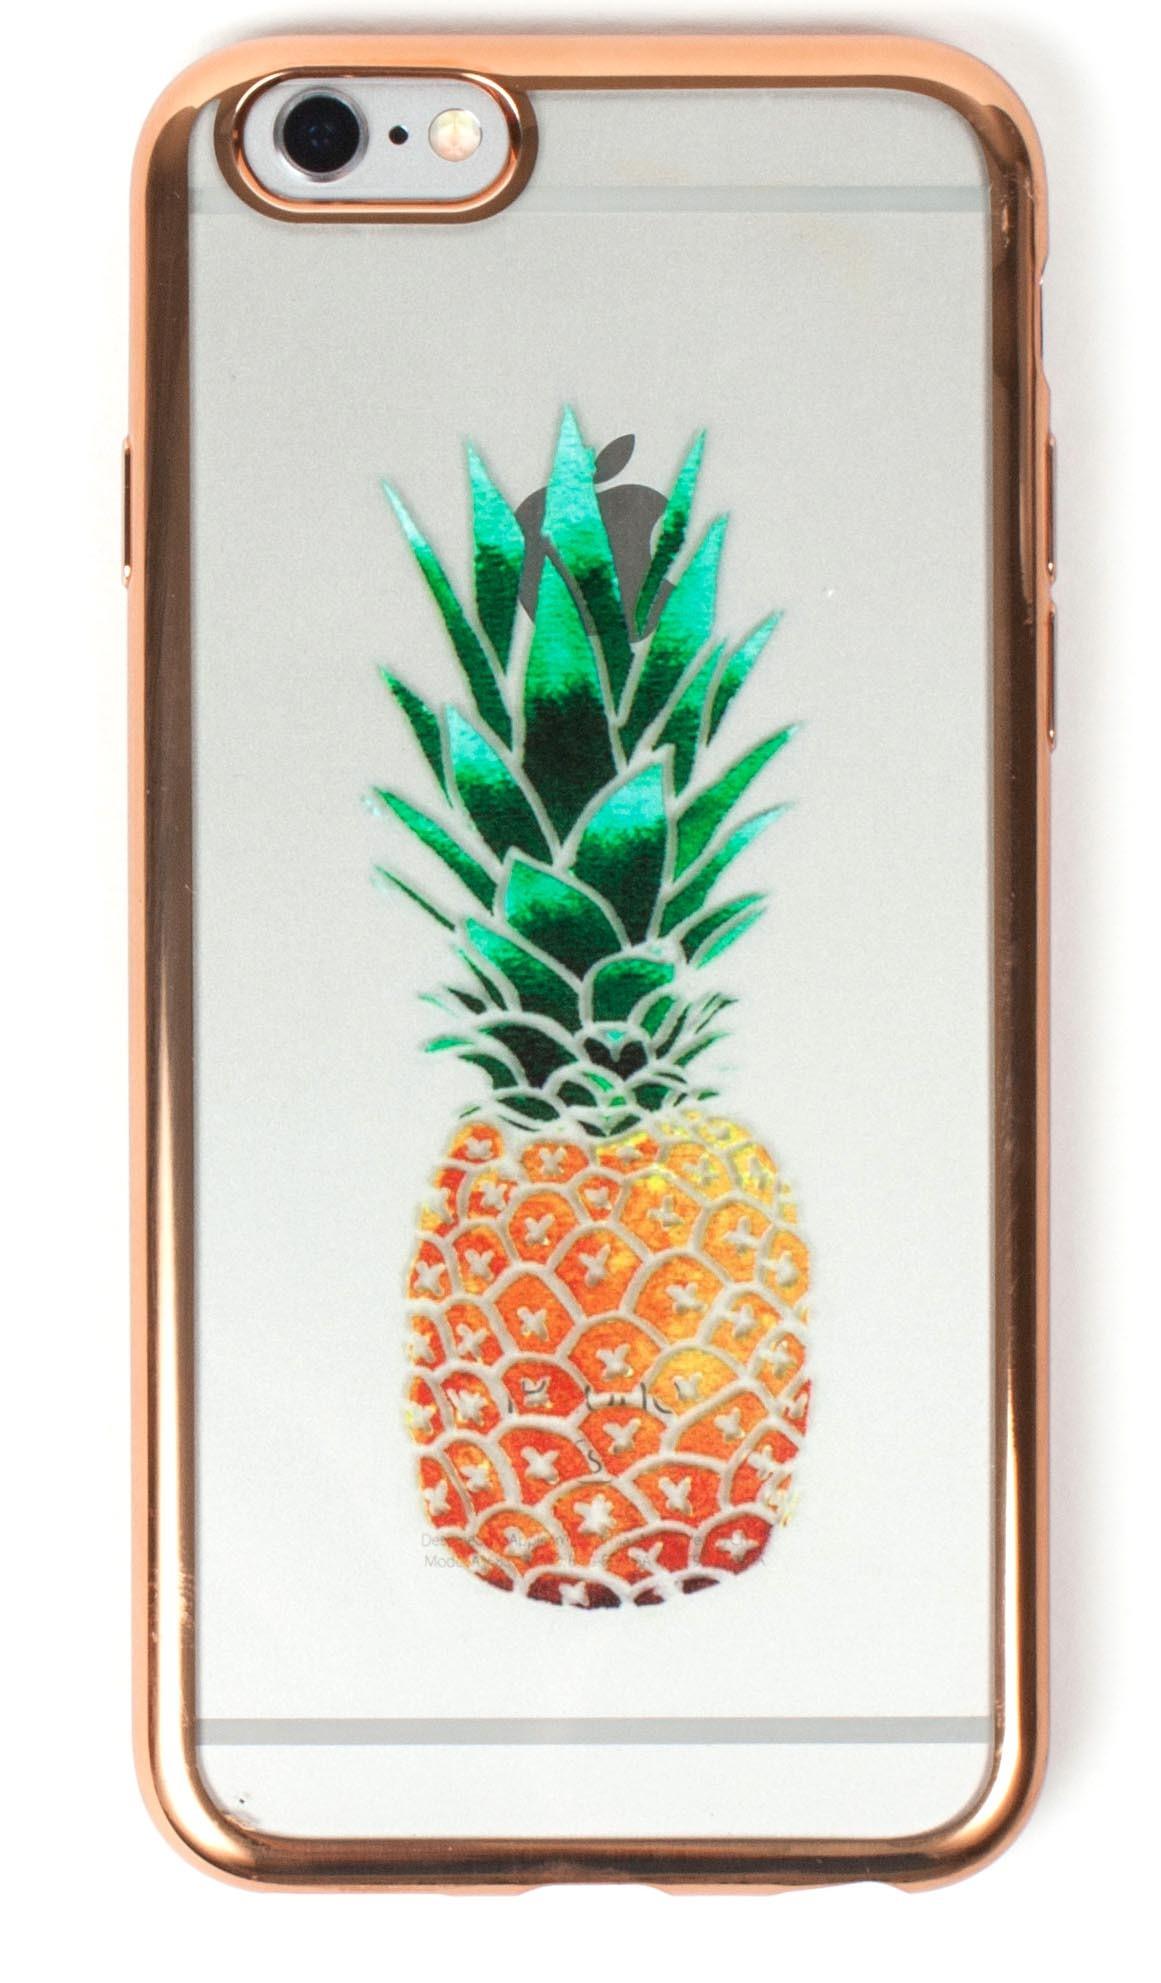 iphone 6 6s case yogacase metaledge cover pineapple. Black Bedroom Furniture Sets. Home Design Ideas